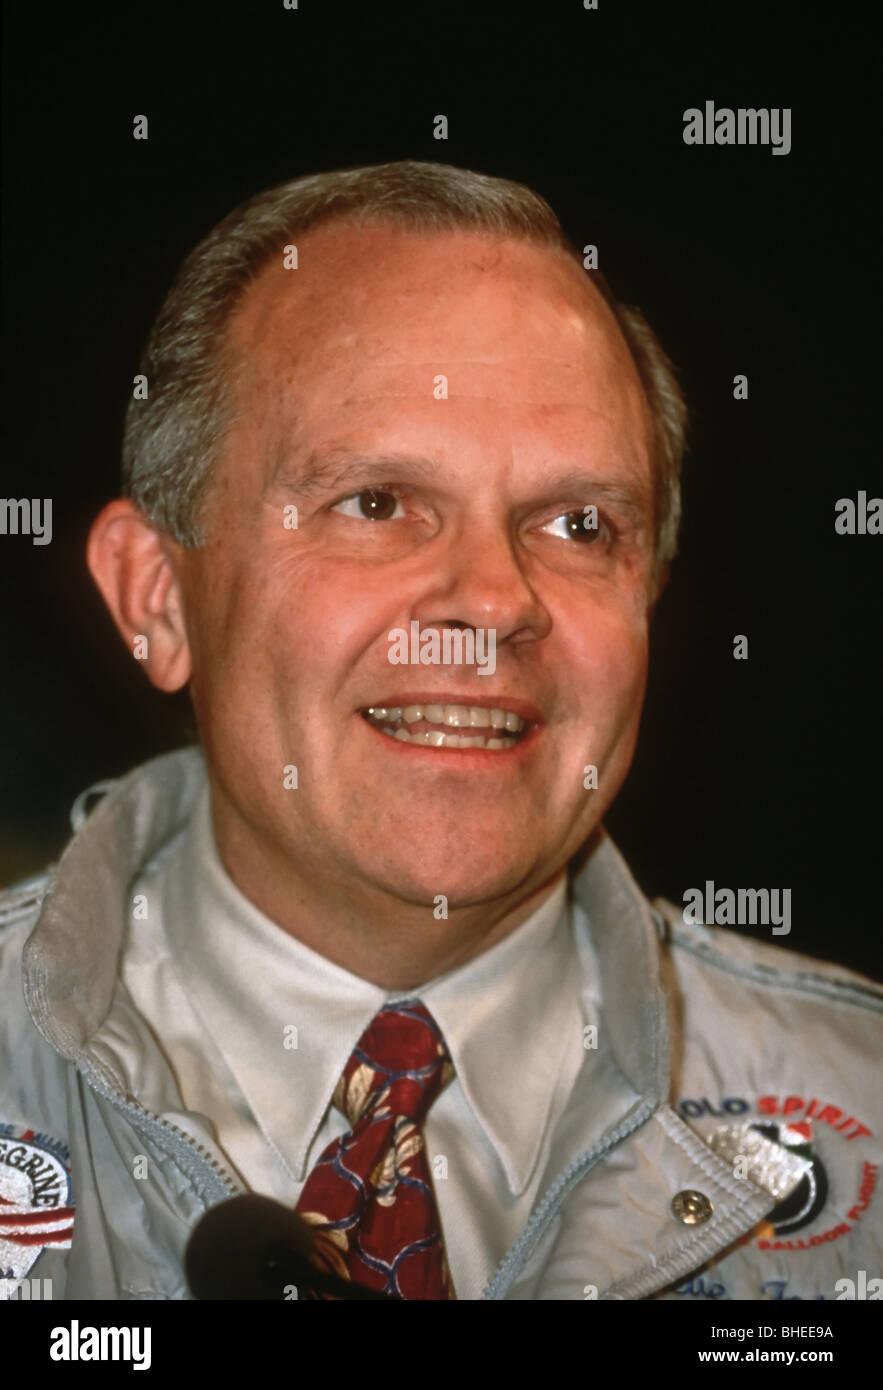 Adventurer Steve Fossett at the National Geographic Society headquarters January 27, 1997 in Washington, DC. - Stock Image